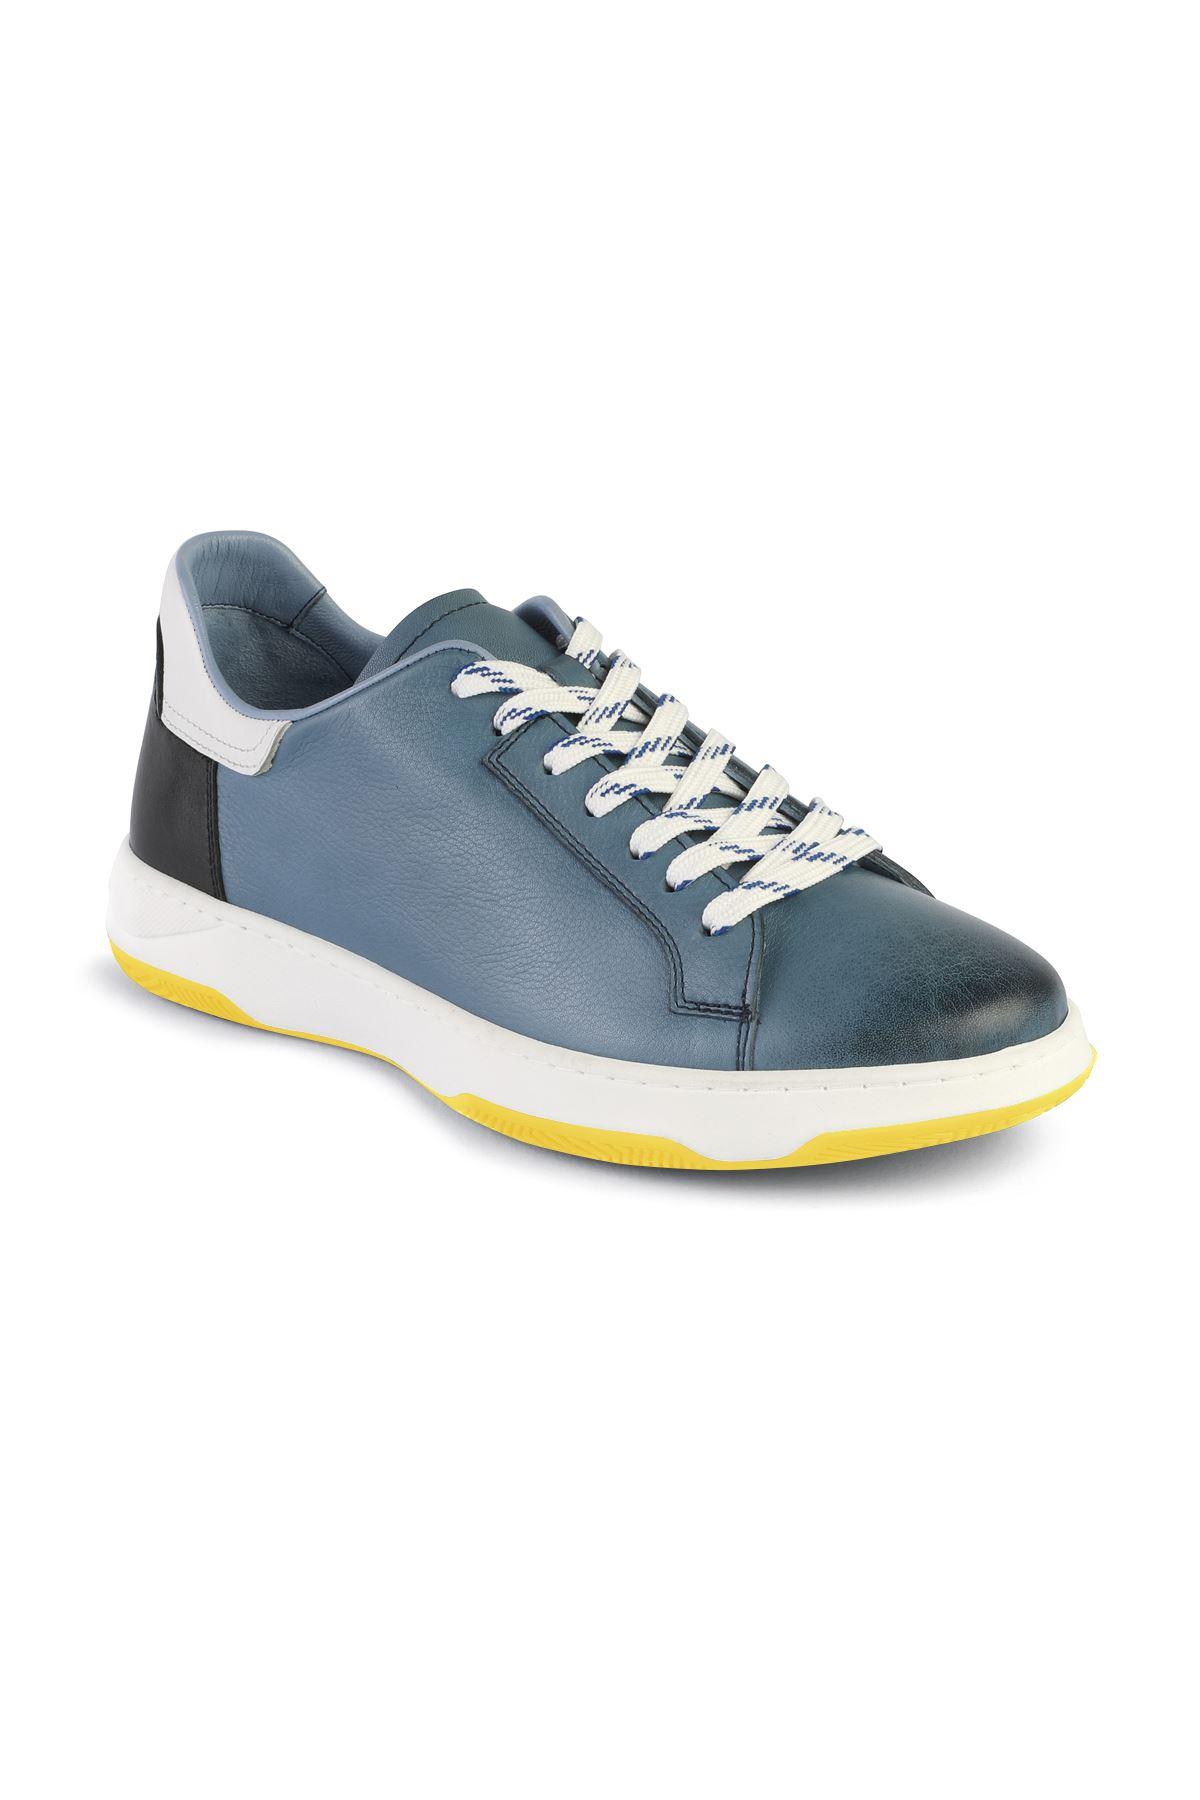 Libero L3227 A.Mavi Spor Ayakkabı